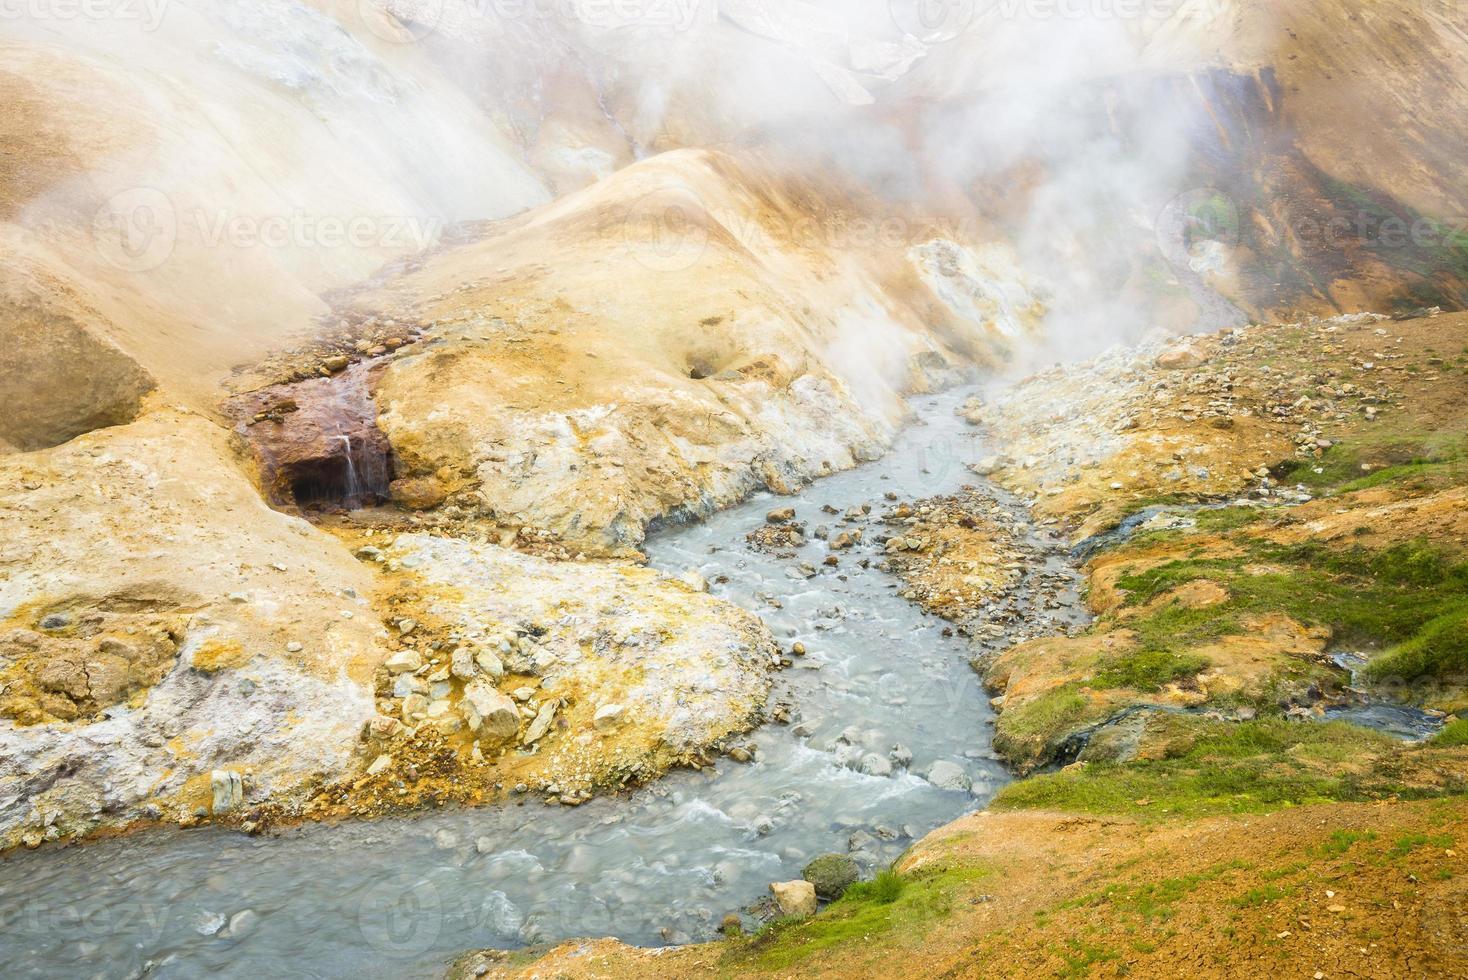 hveradalir, vale de fontes termais em kerlingarfjoll area, islândia foto